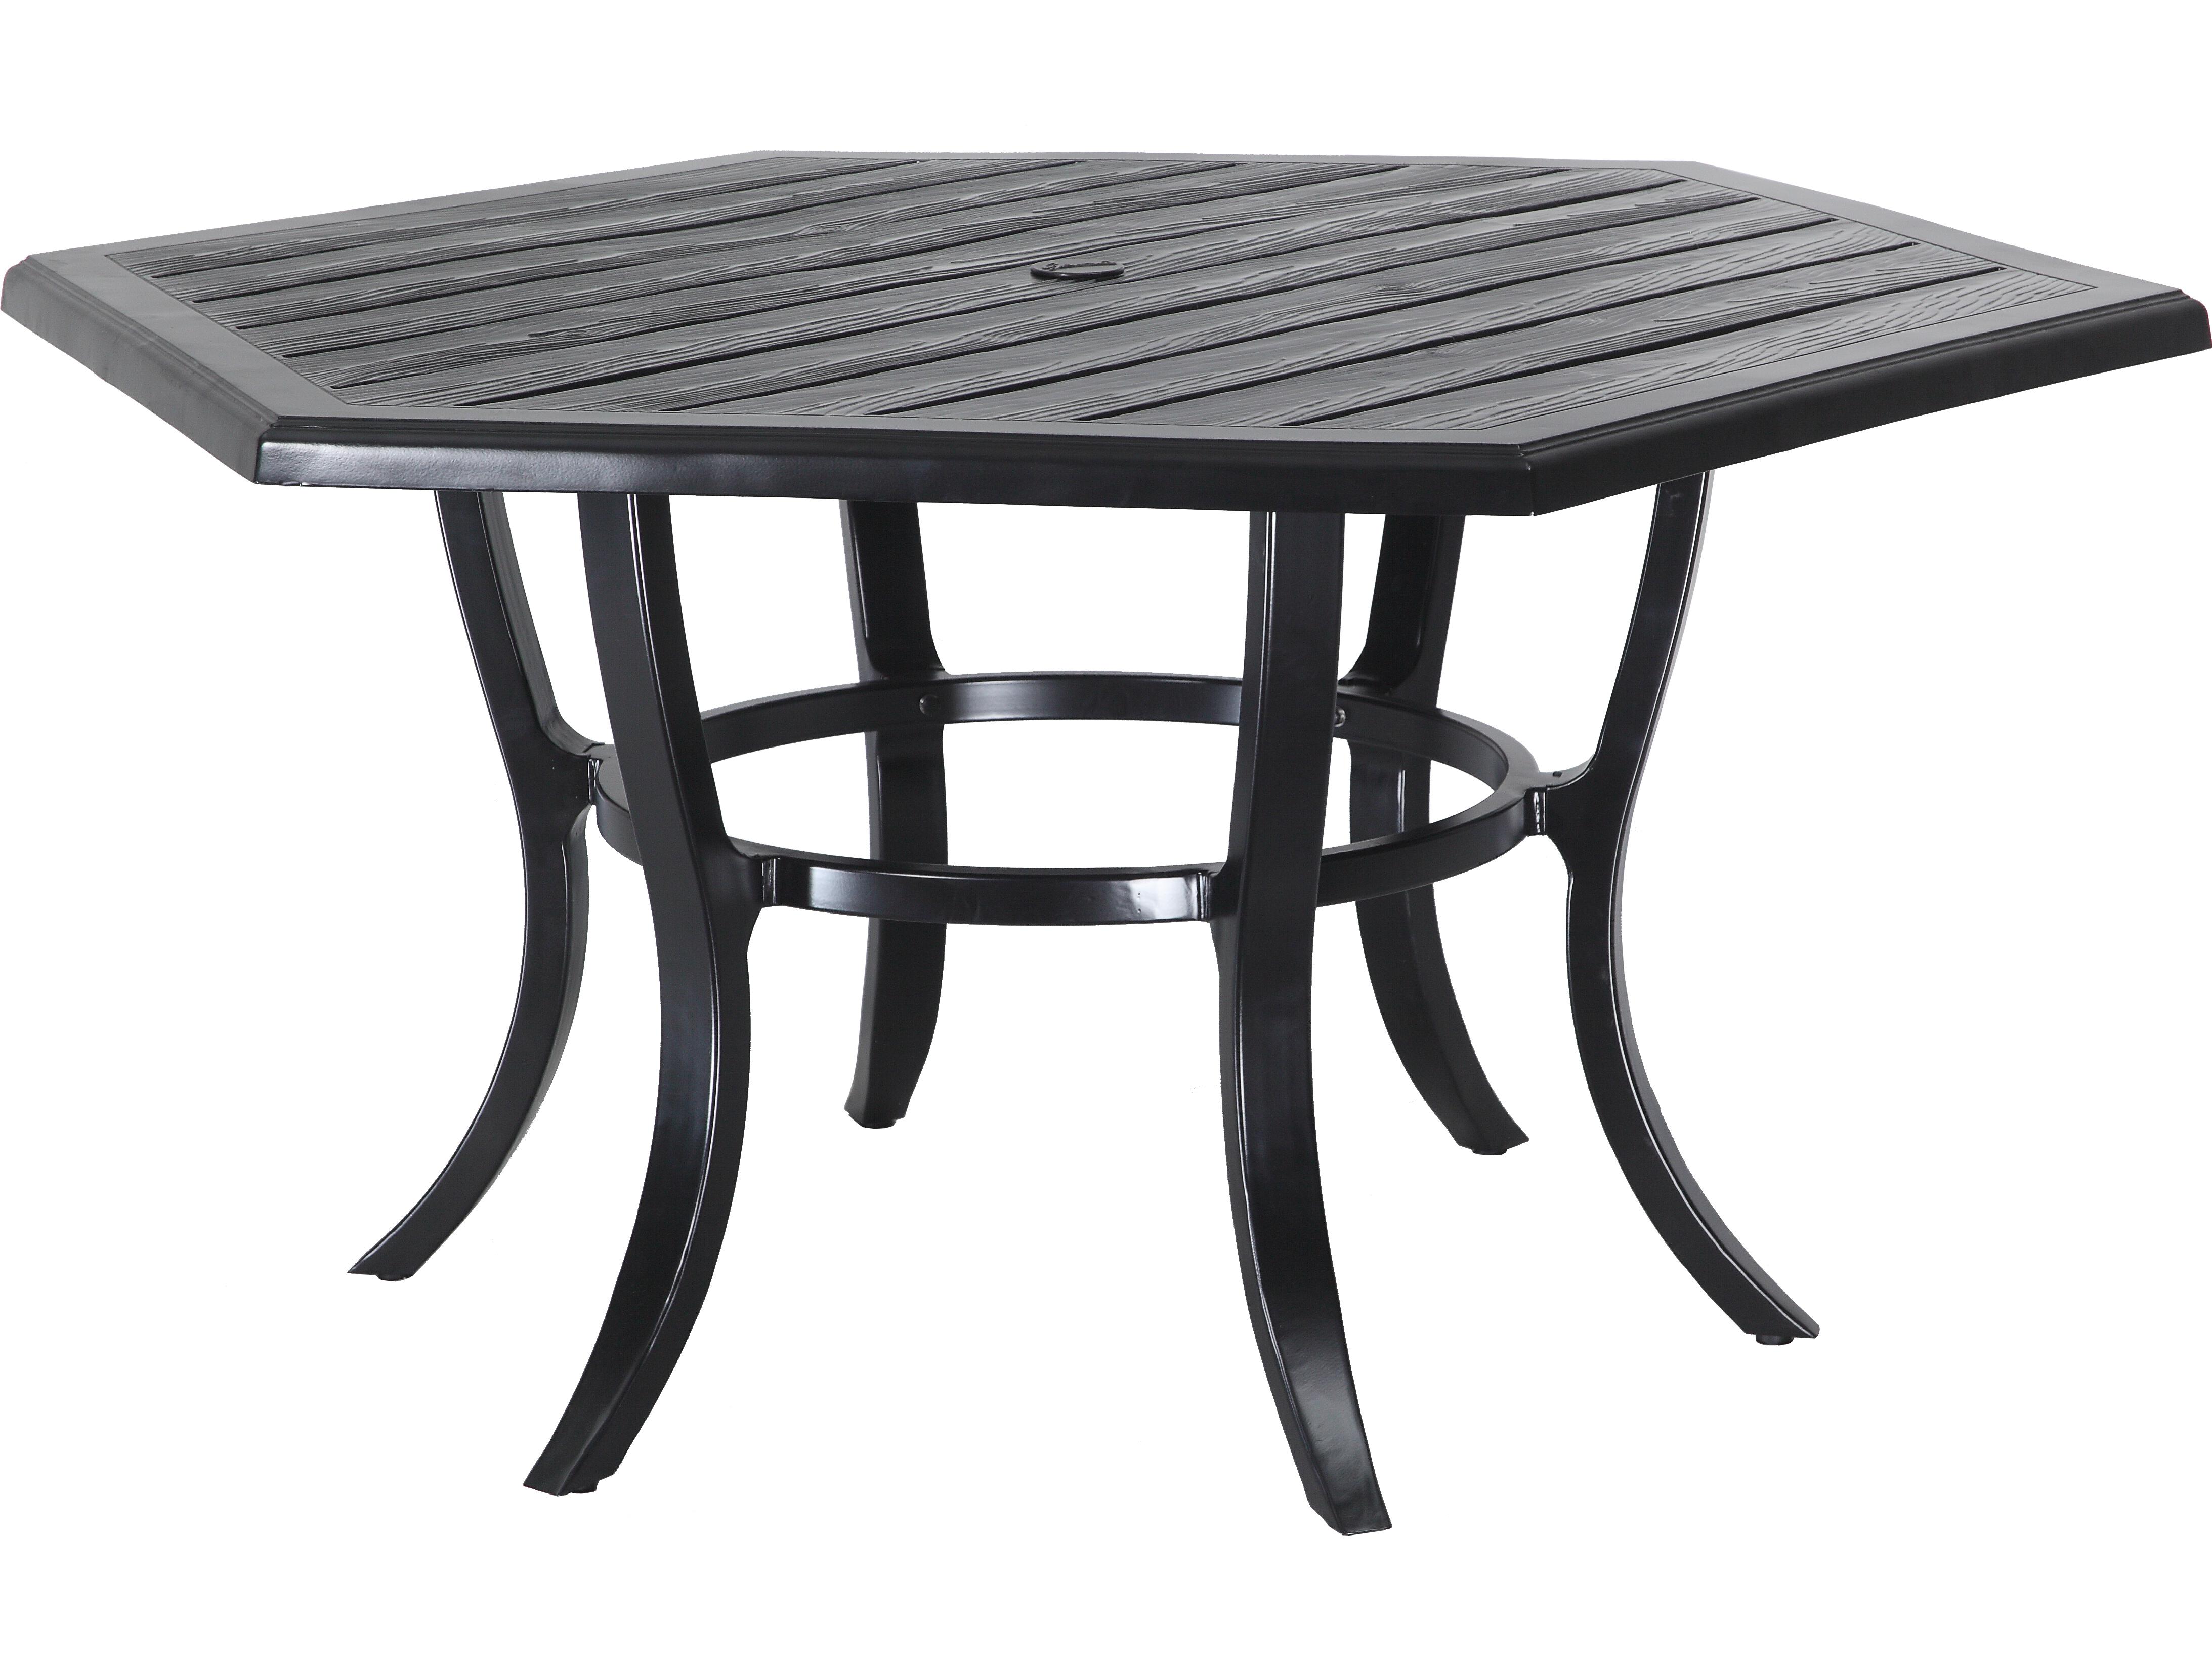 Gensun Lattice Cast Aluminum 61 Hexagon Dining Table With